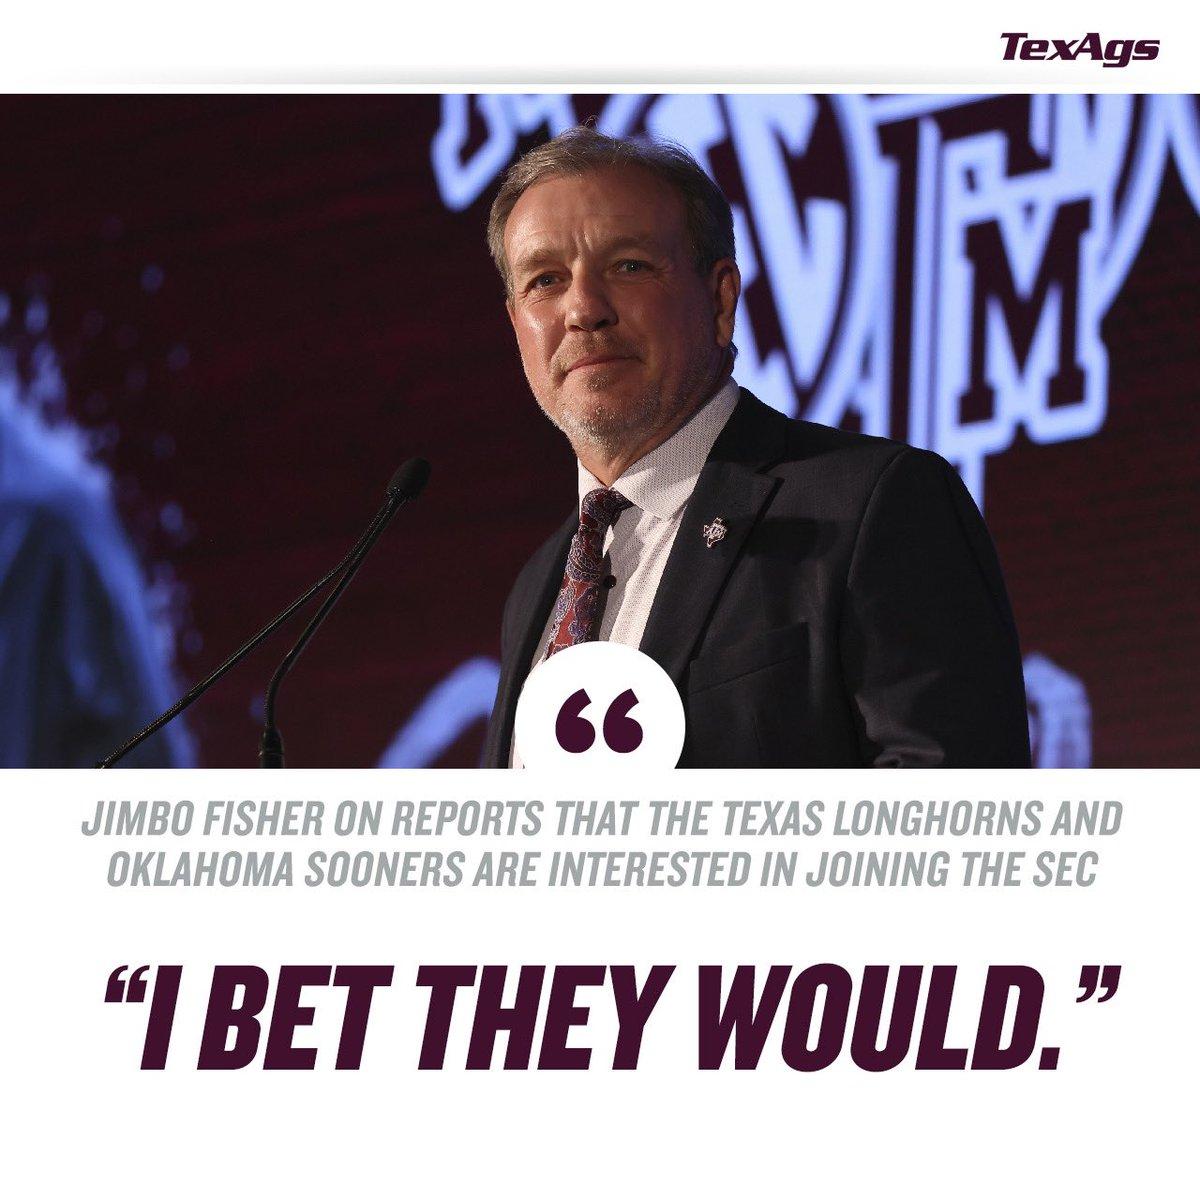 @TexAgs's photo on Jimbo Fisher